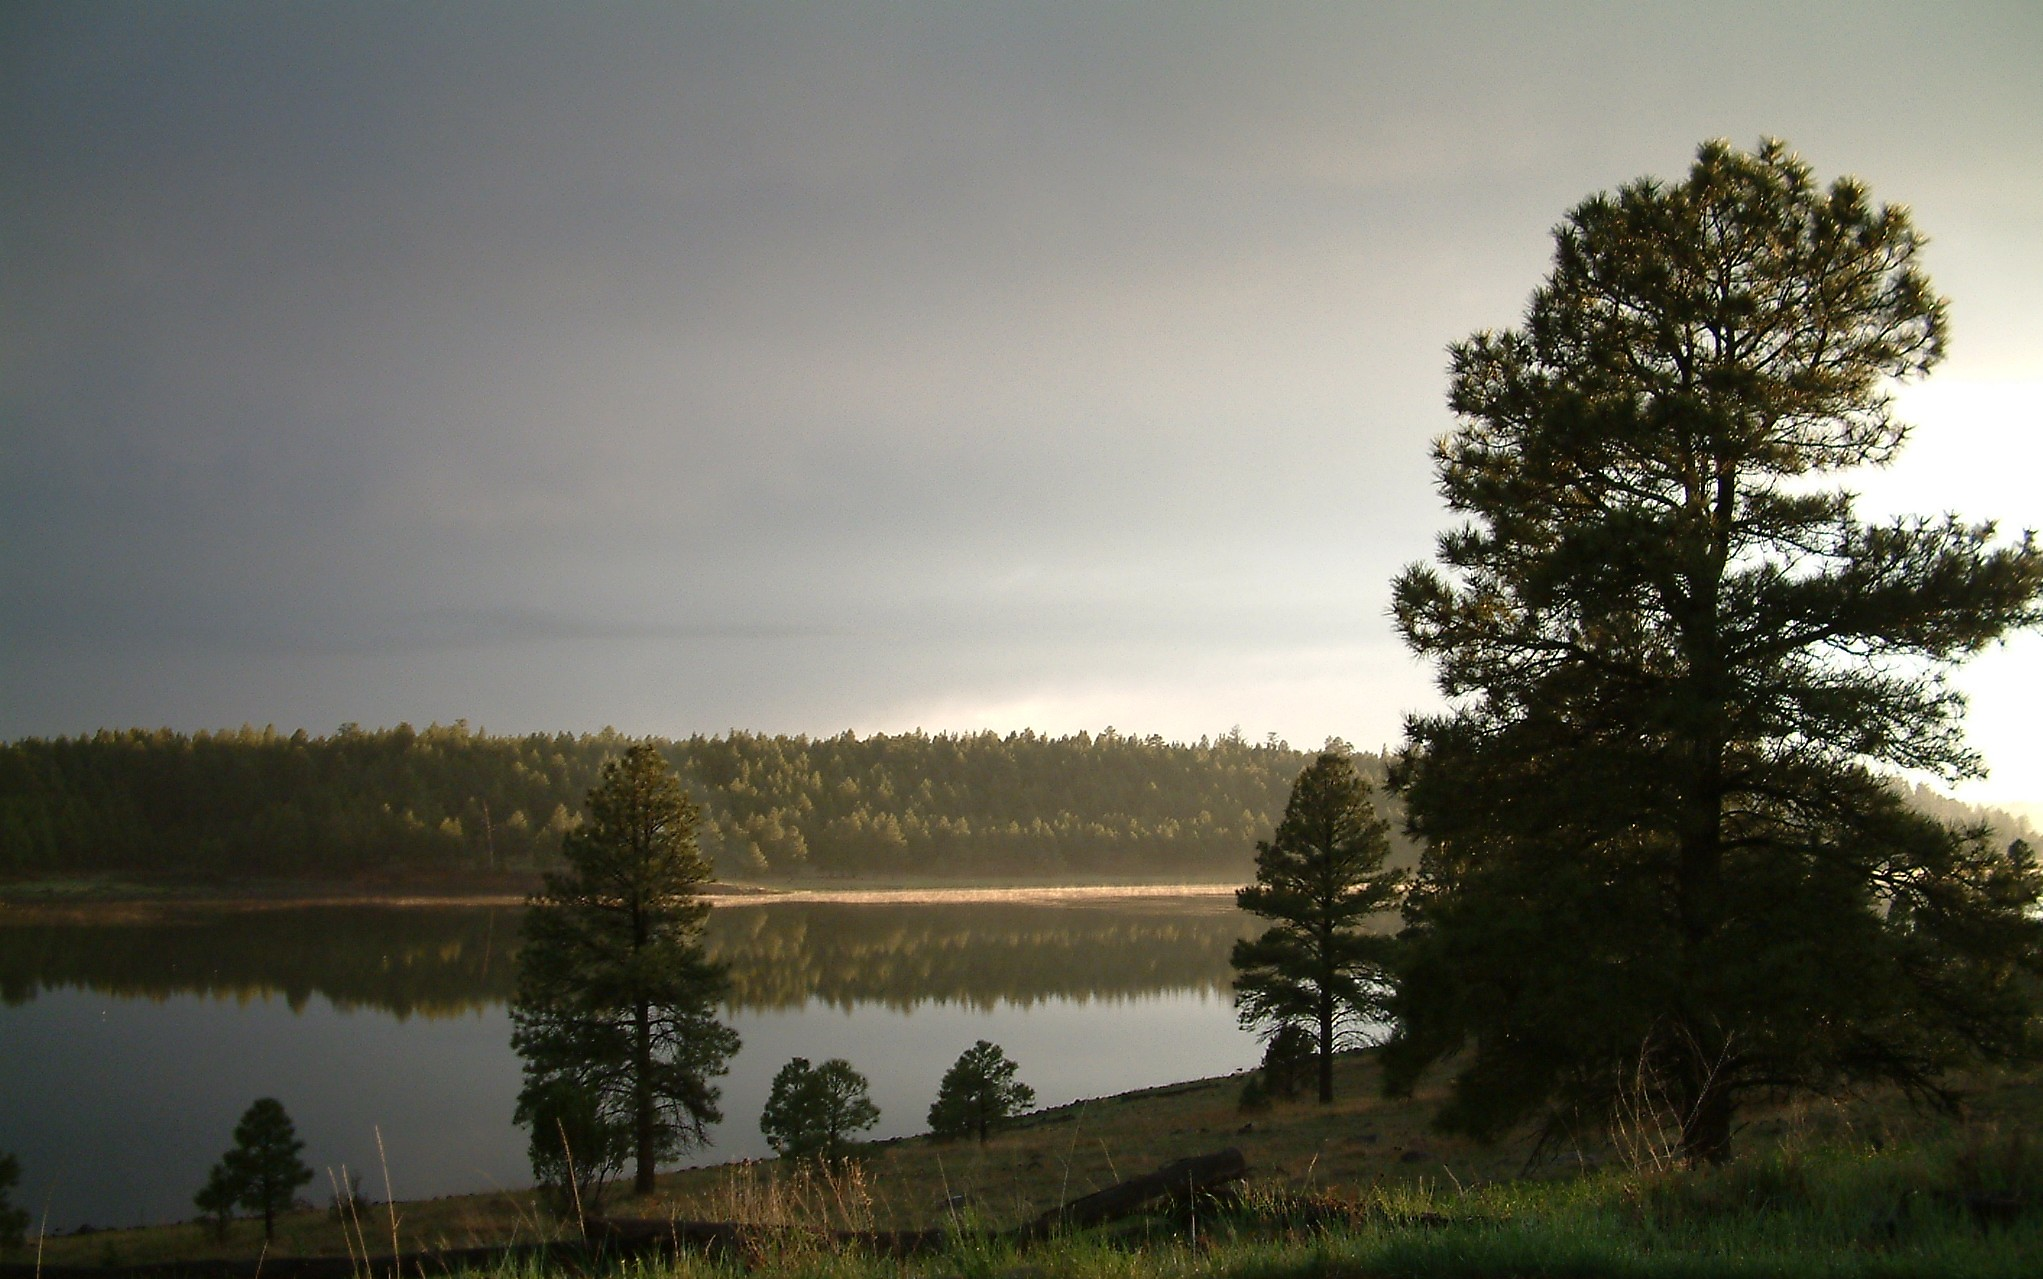 Lake Mary outside of Flagstaff, Arizona